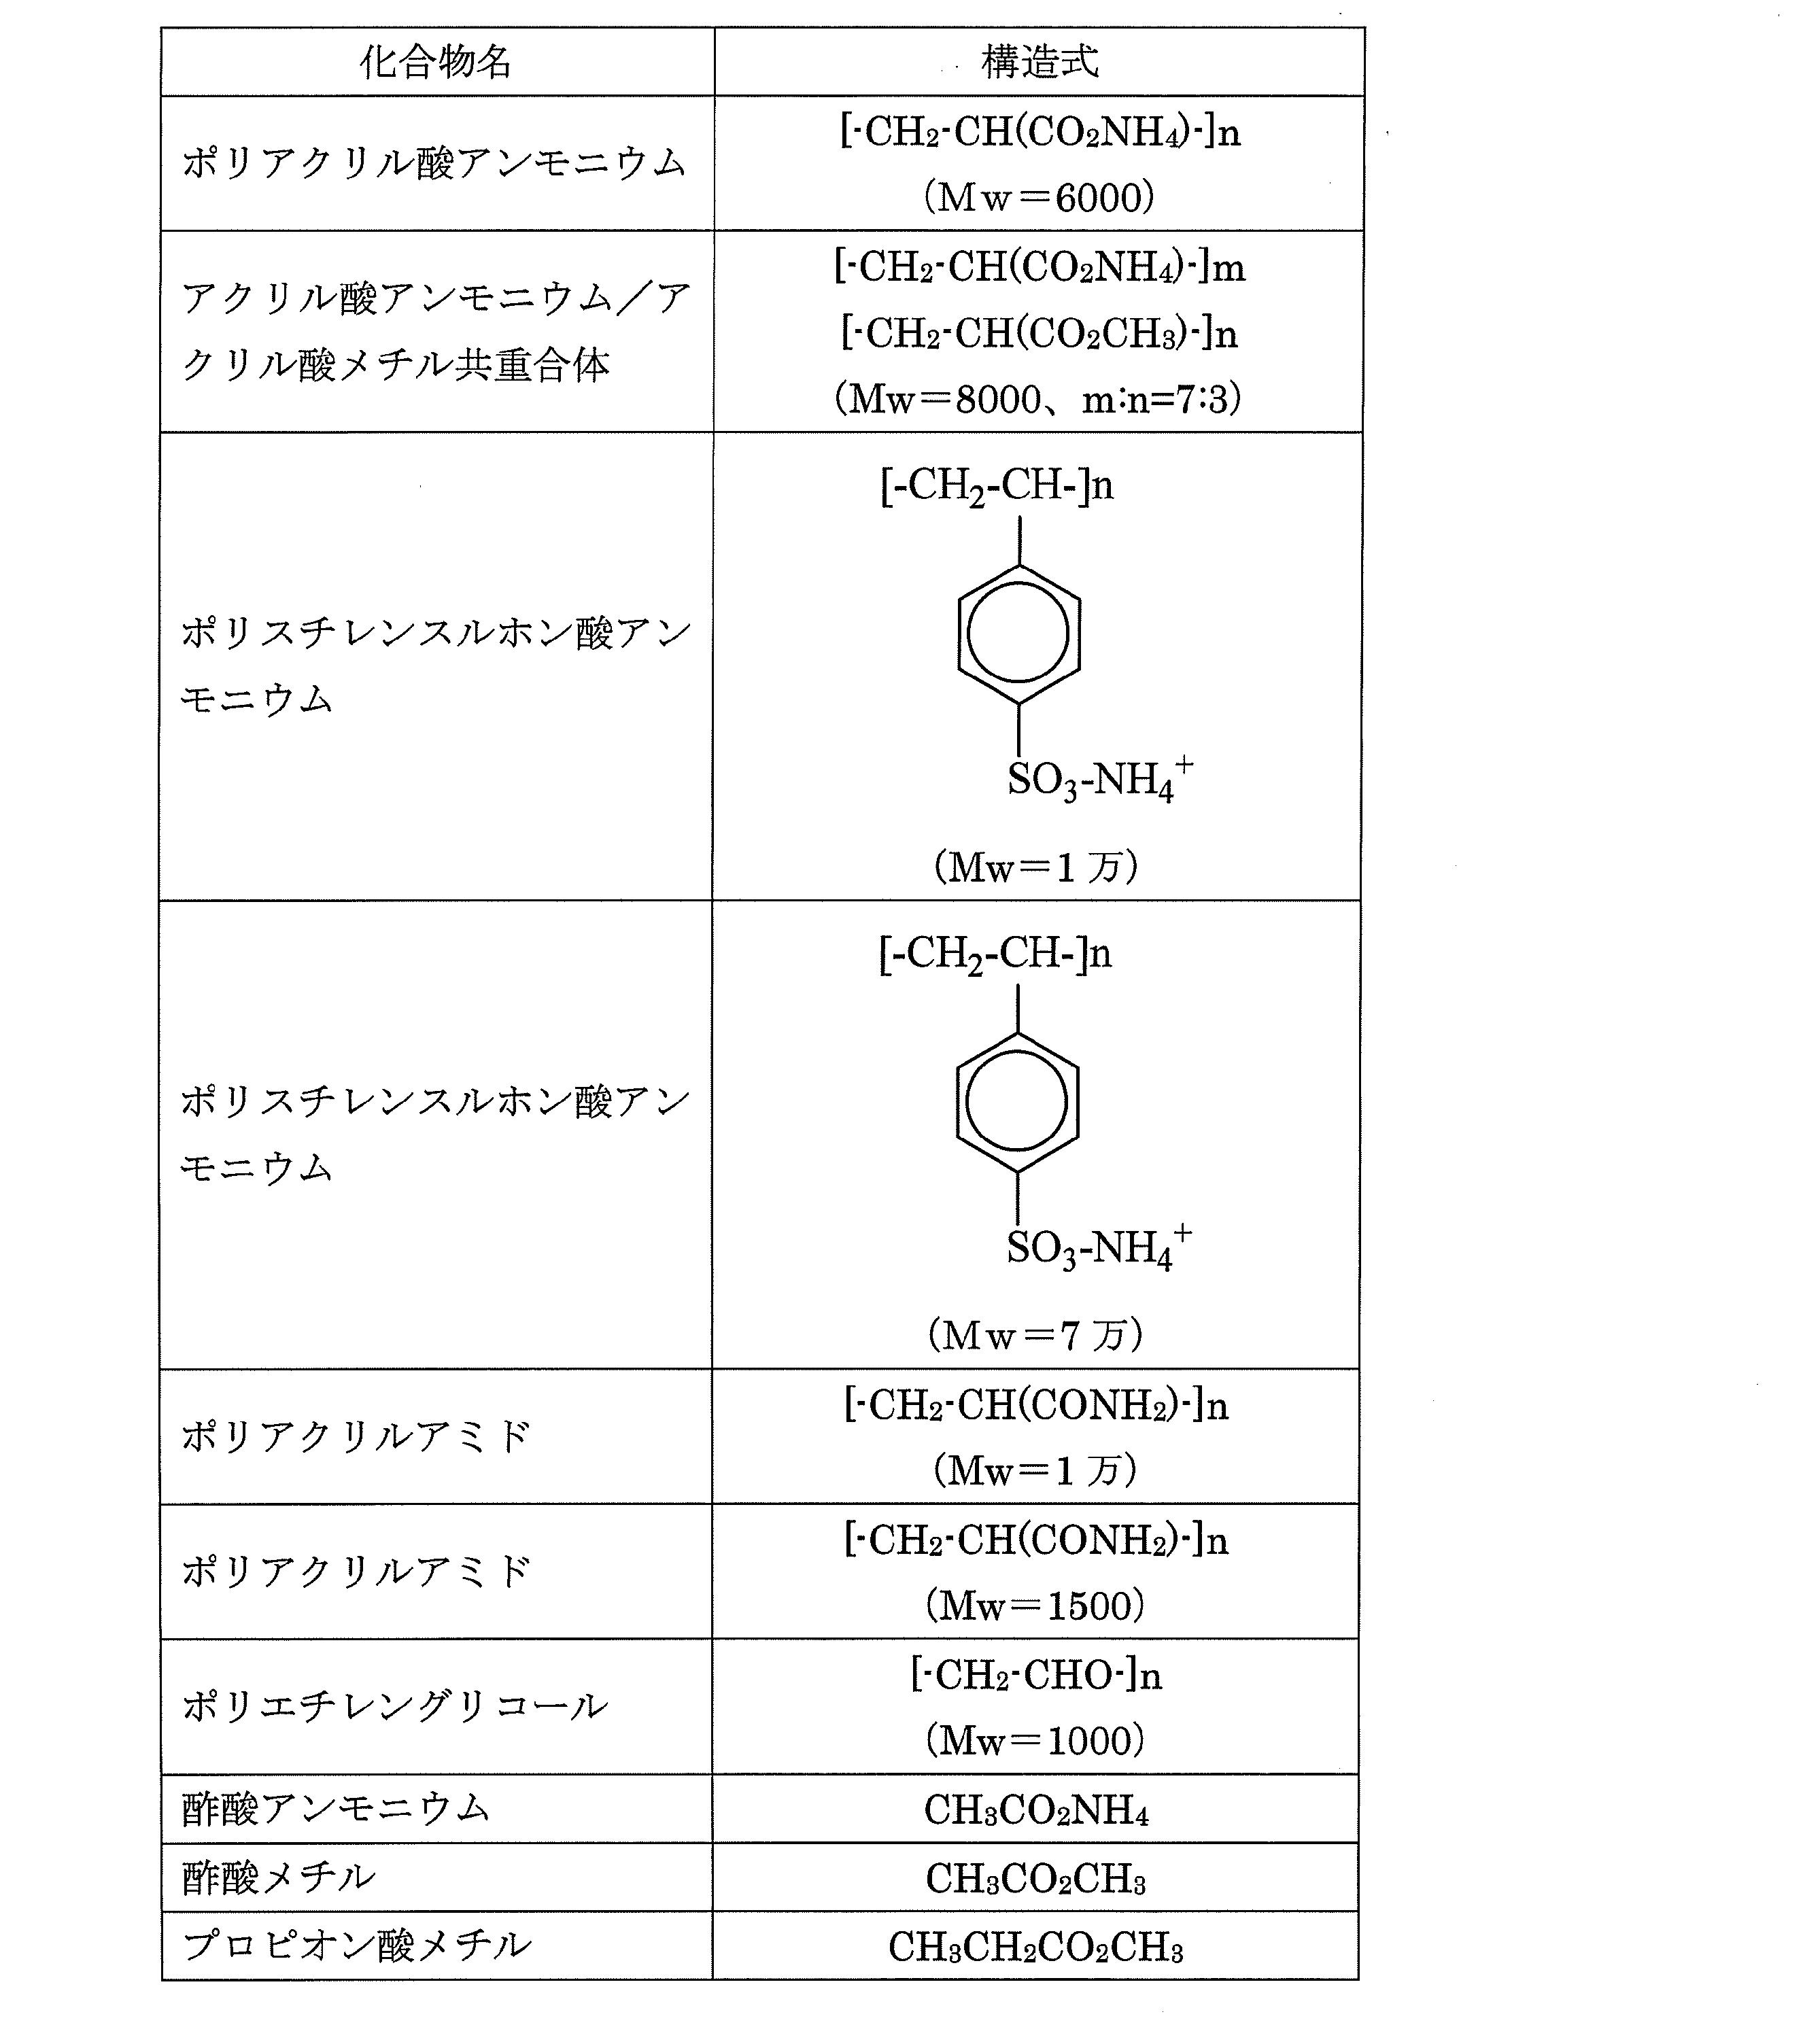 WO2010134184A1 - 微細加工処理剤、及び微細加工処理方法         - Google PatentsFamily